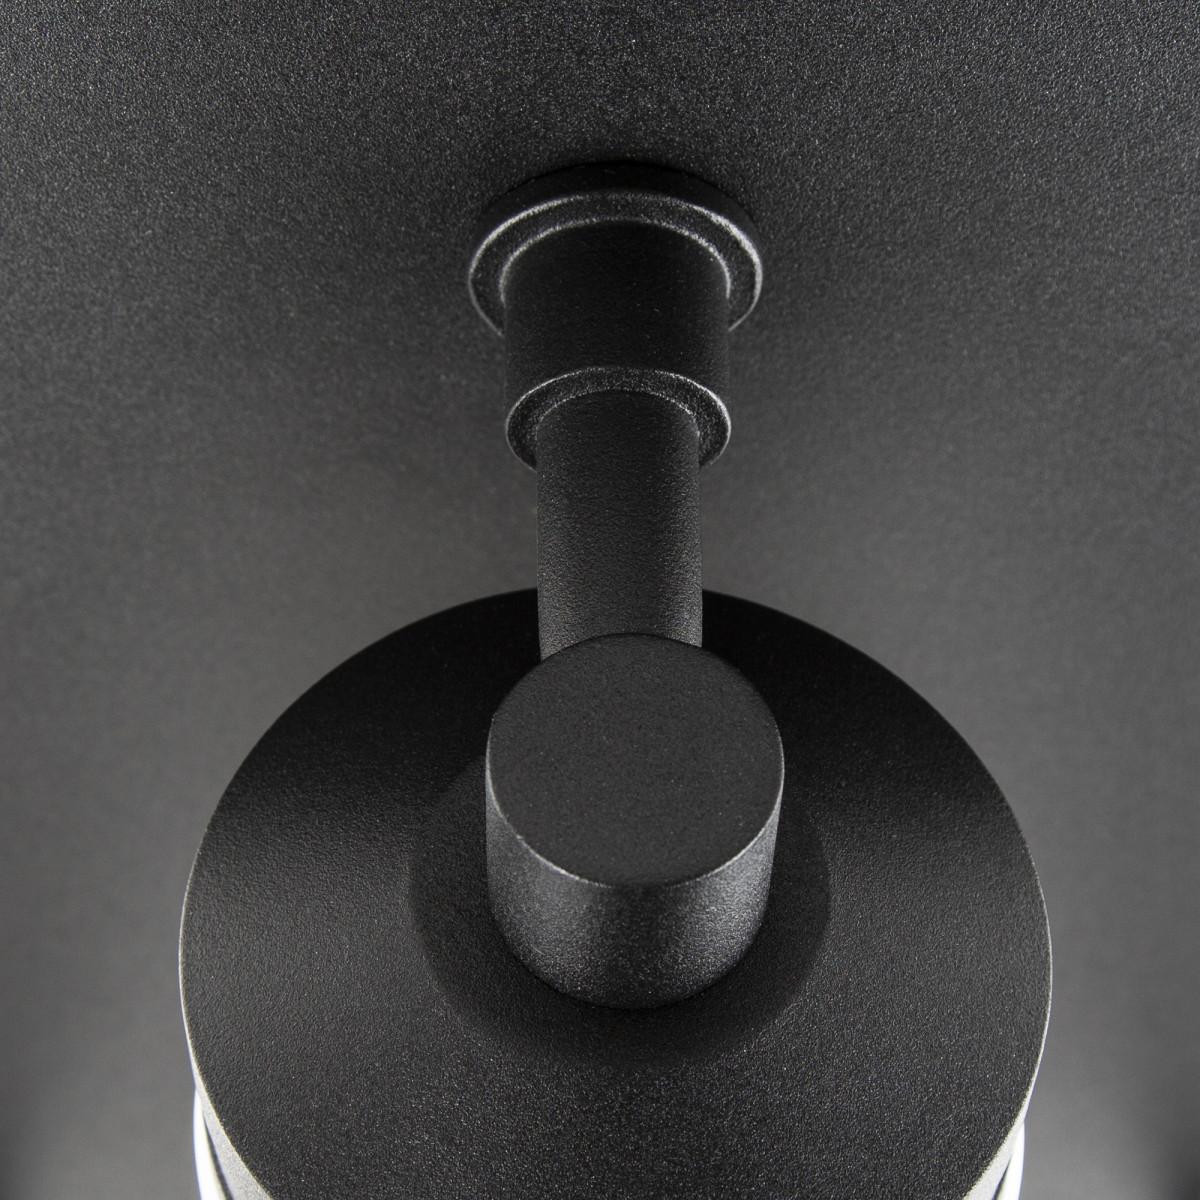 Buitenlamp Hudson, moderne buitenverlichting, sfeervol en functioneel, modern box design, KS Verlichting